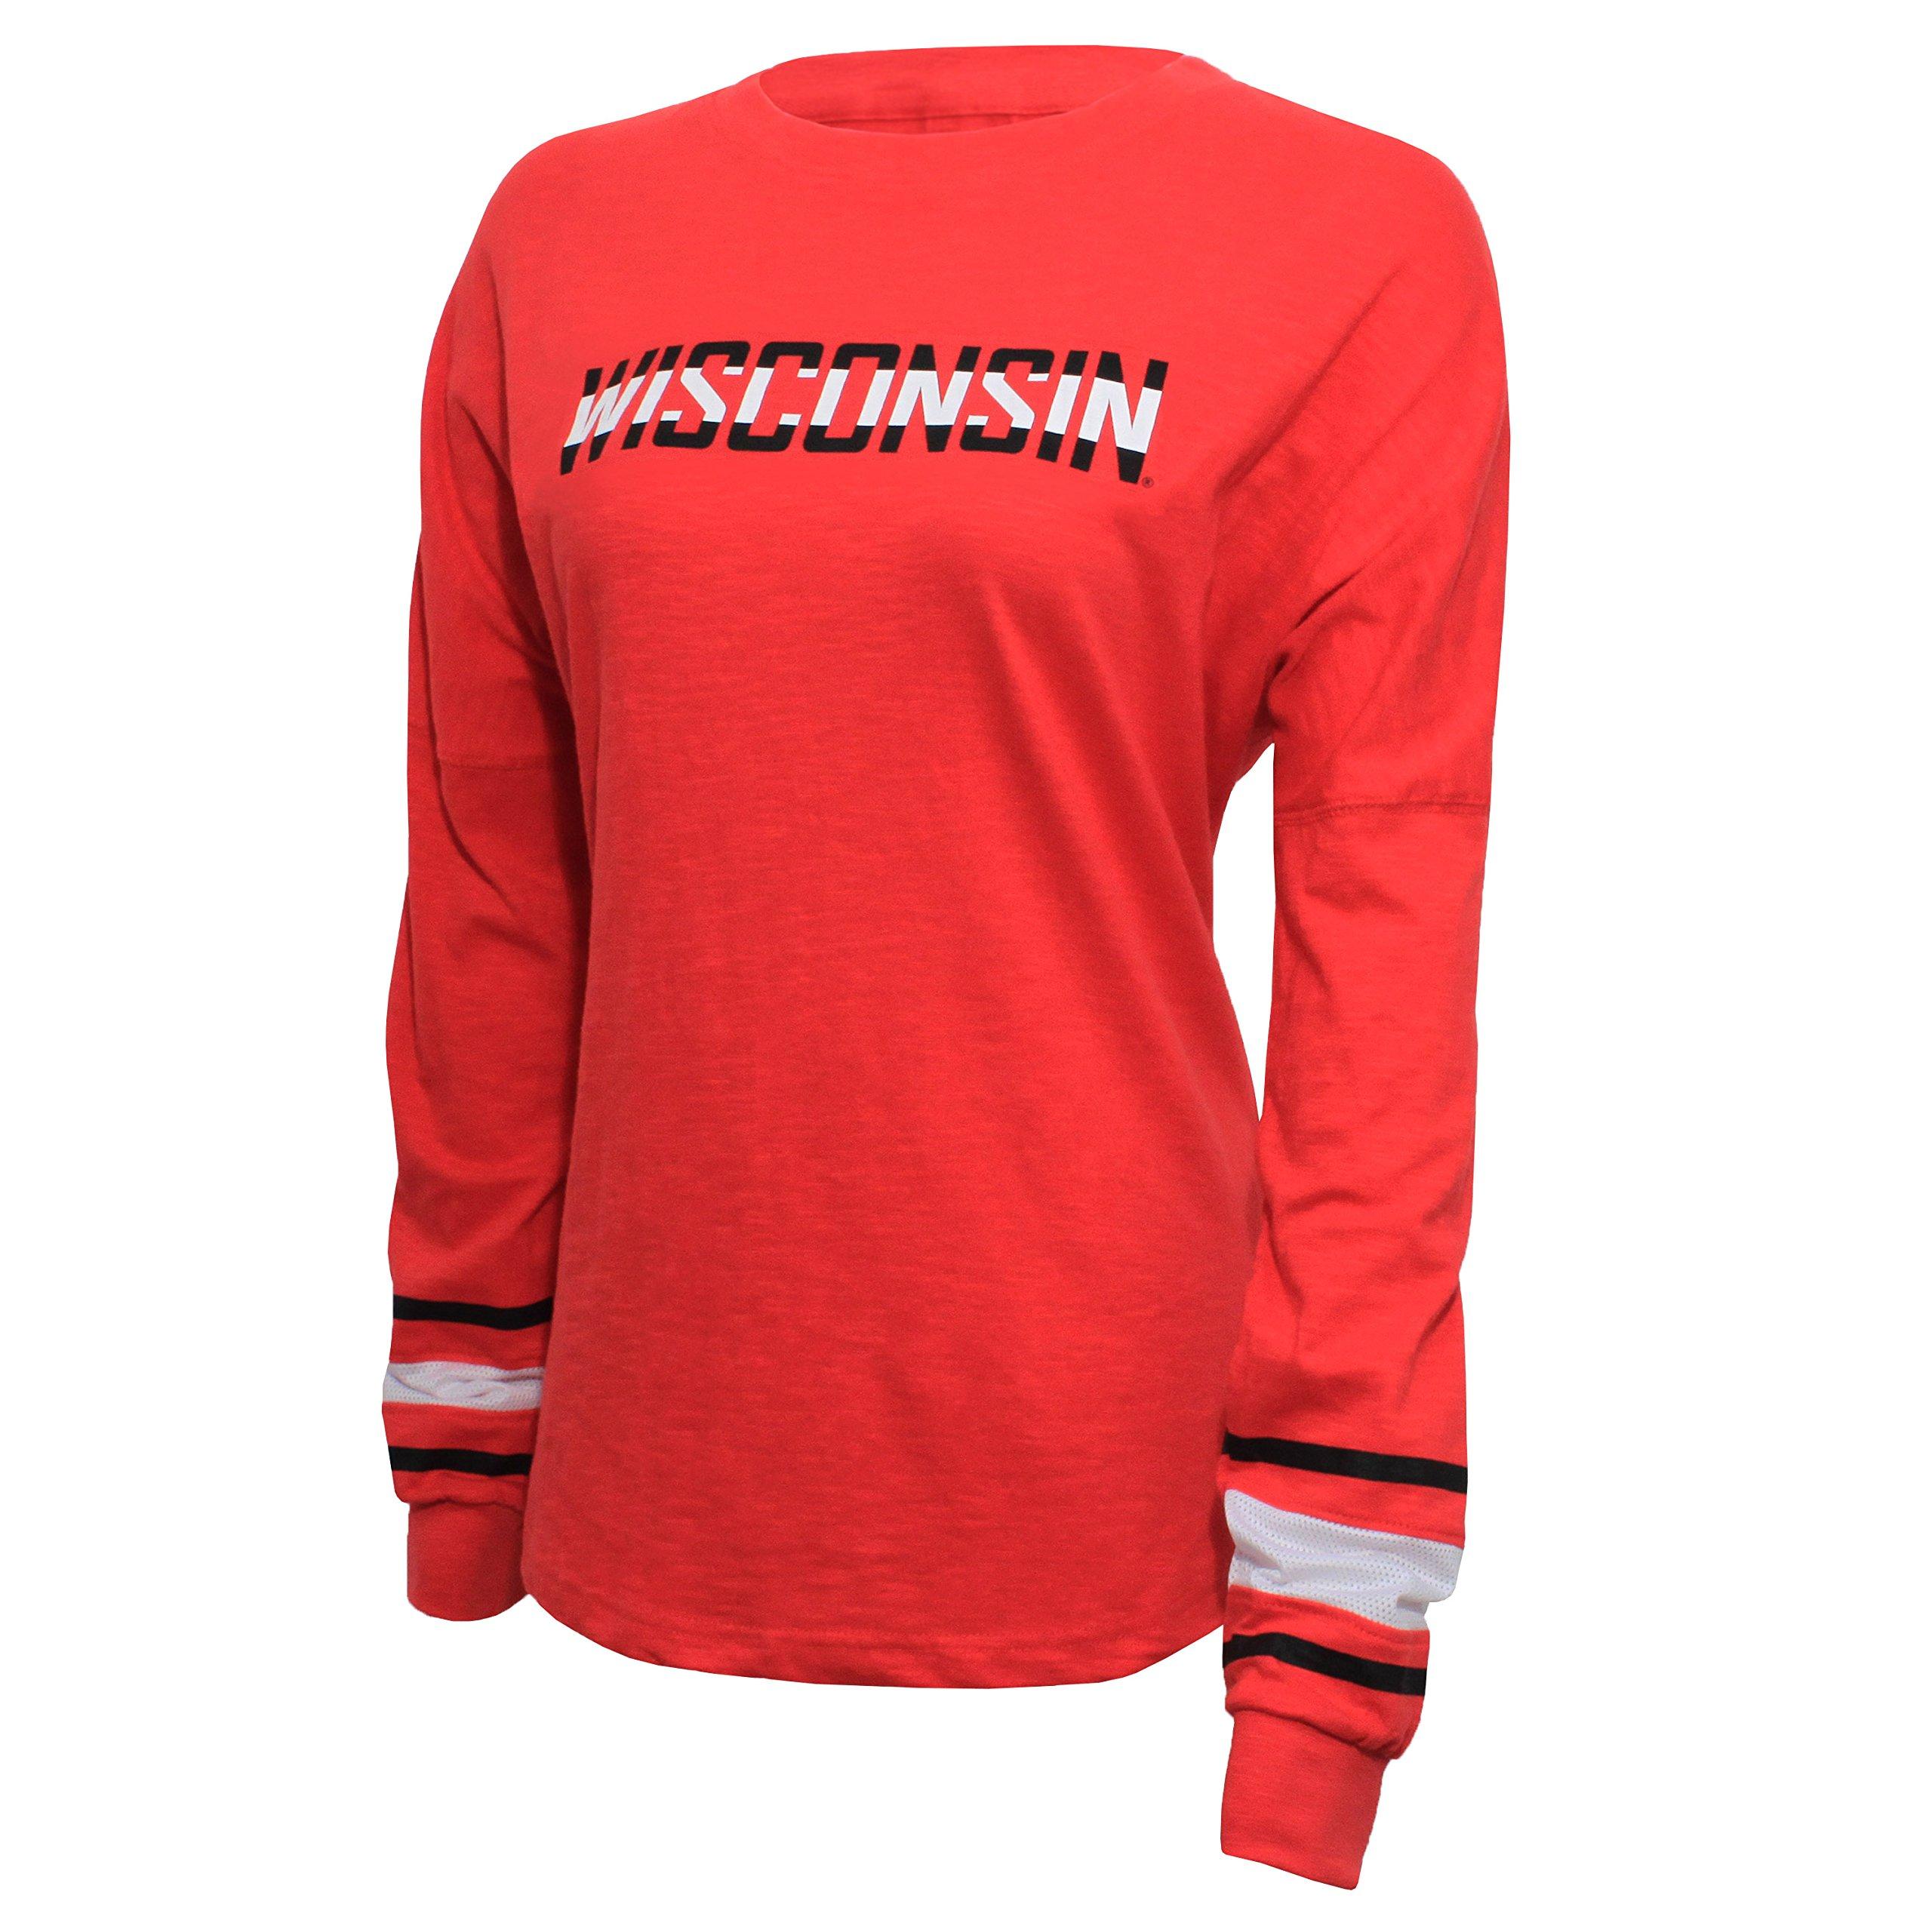 NCAA Wisconsin Badgers Women's Campus Specialties Long Sleeve Fan Tee, Medium, Red by Crable